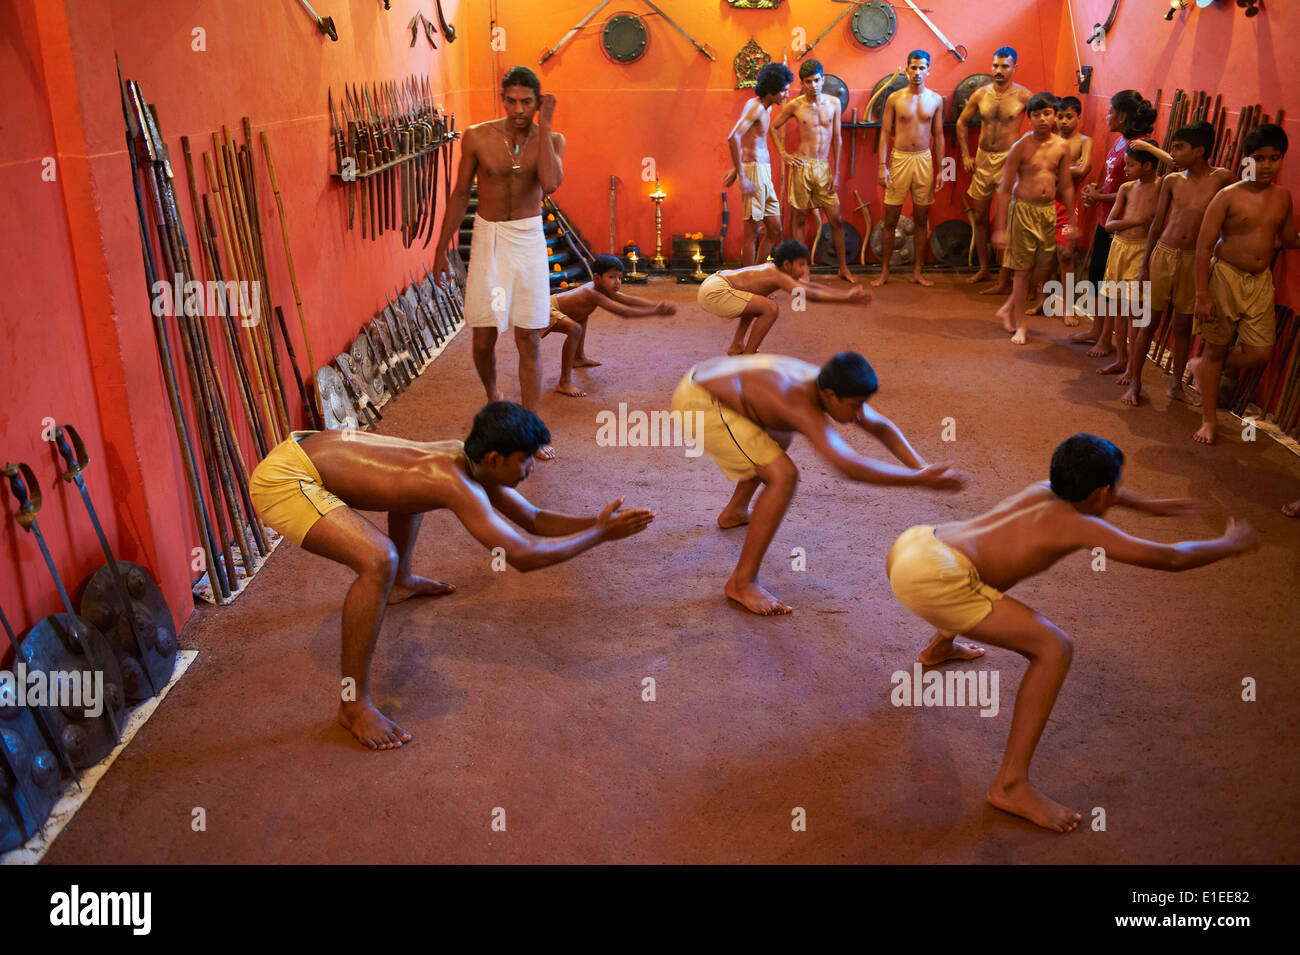 India, Kerala state, Kalarippaya school (Kalari) - Stock Image